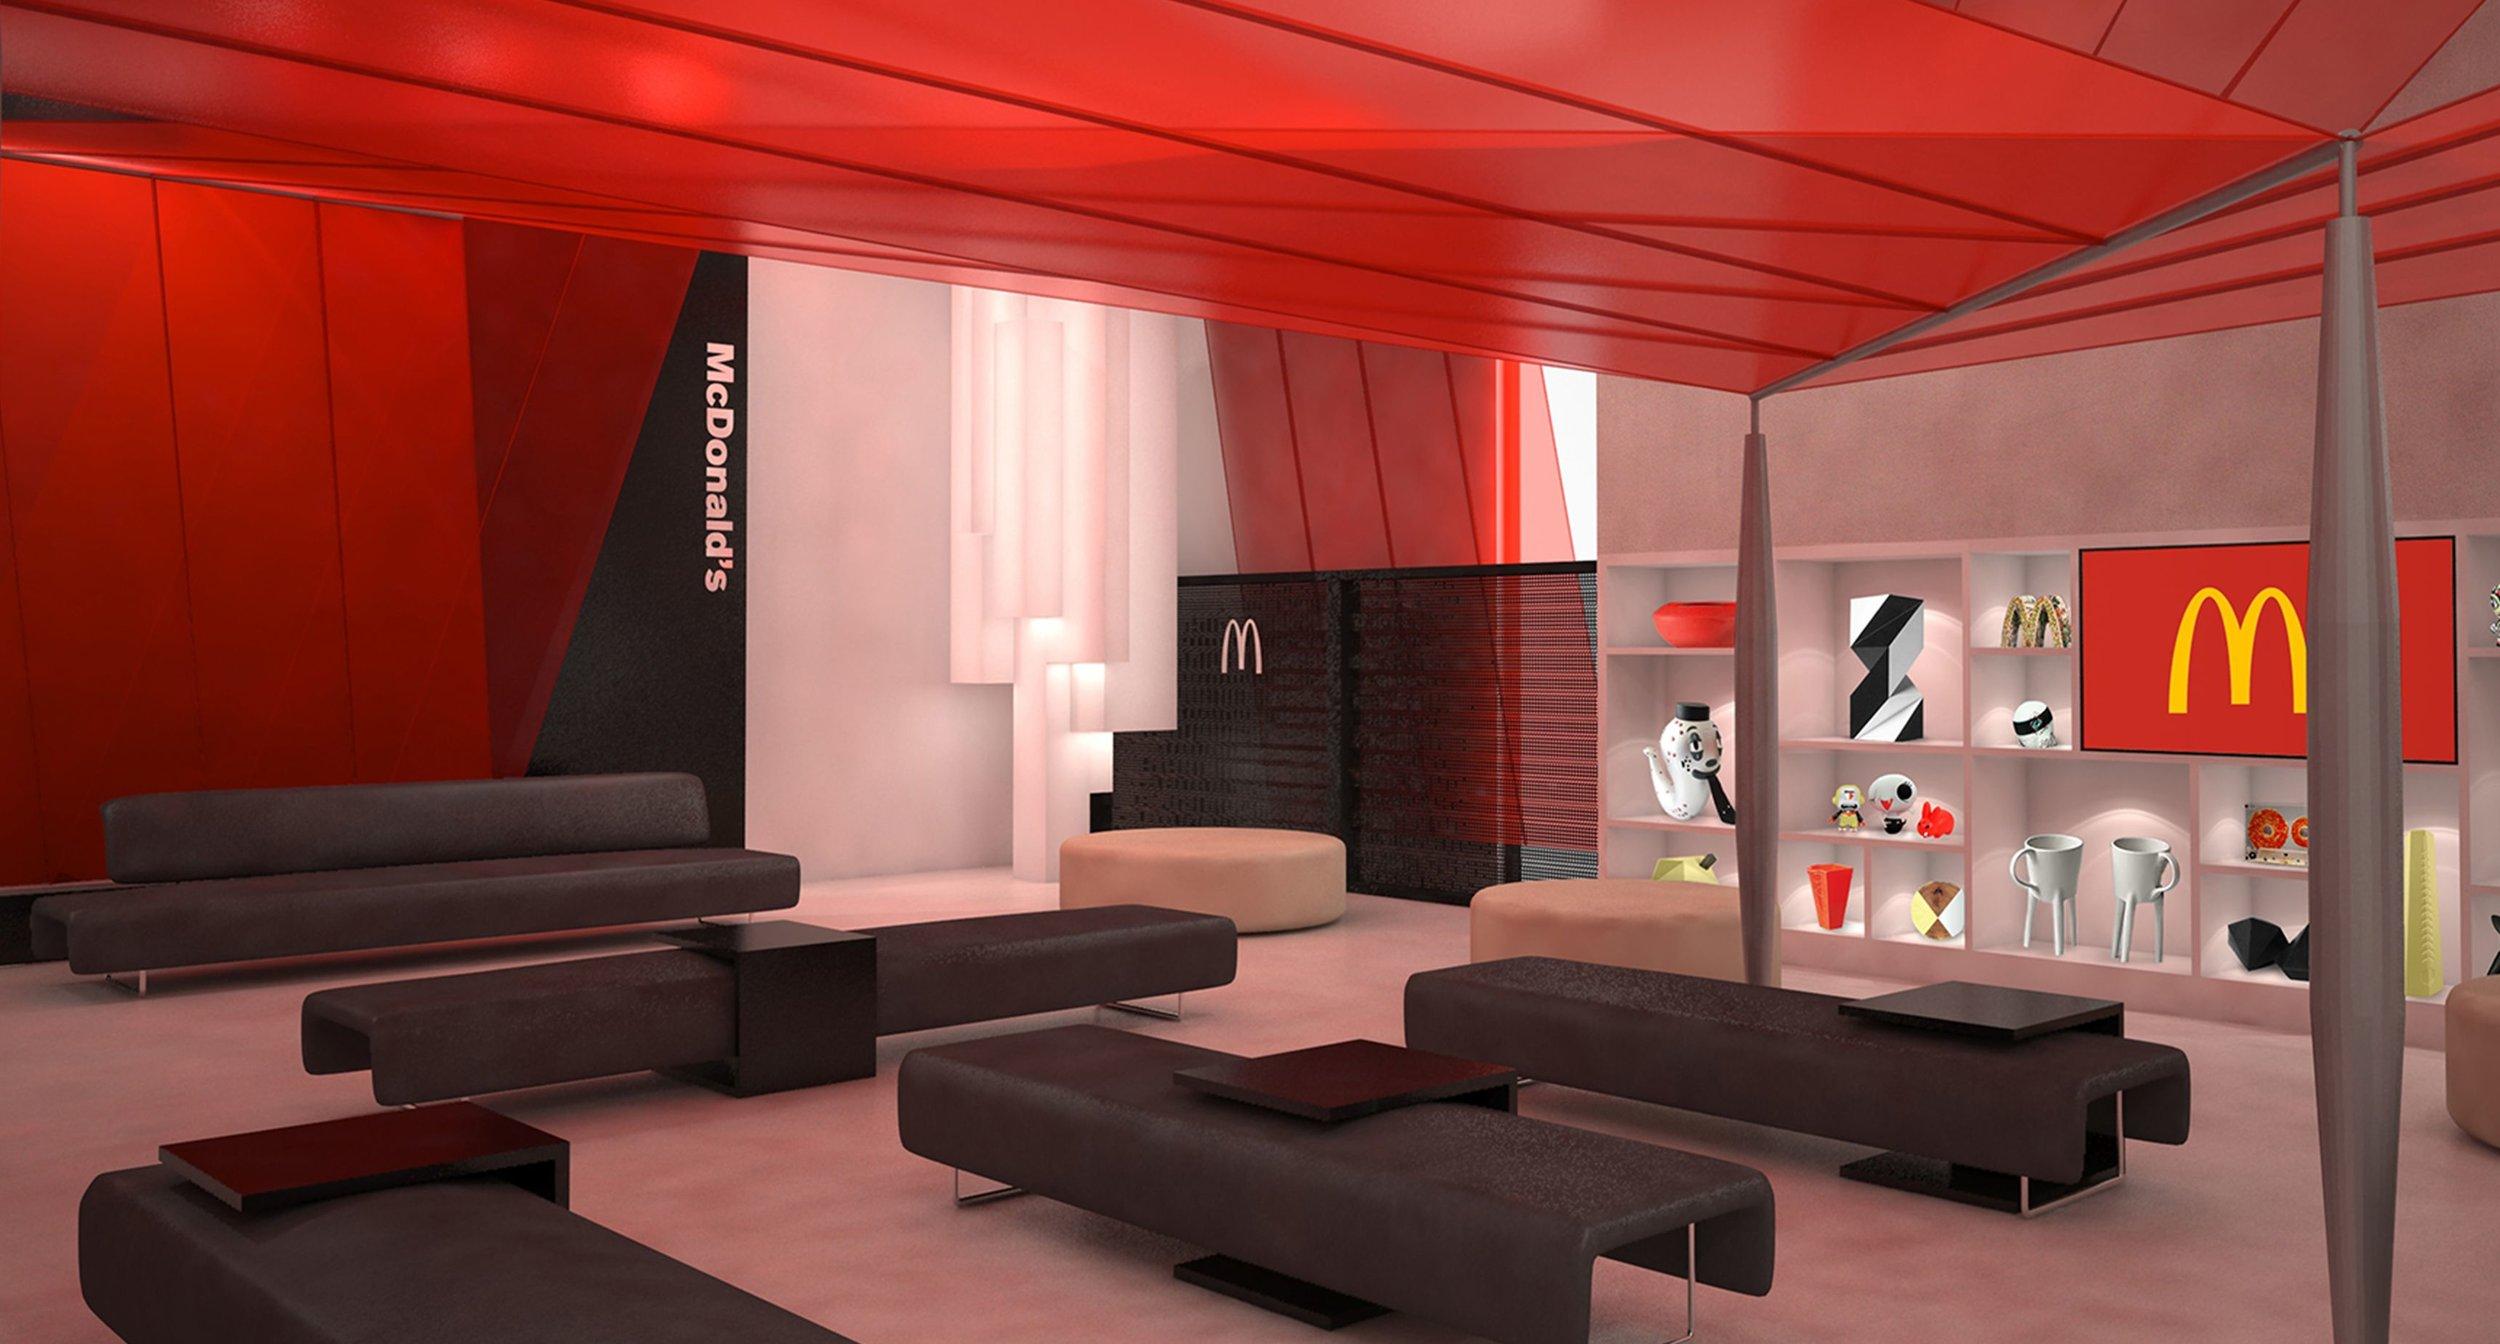 Rendering of McDonald's SXSW Lounge